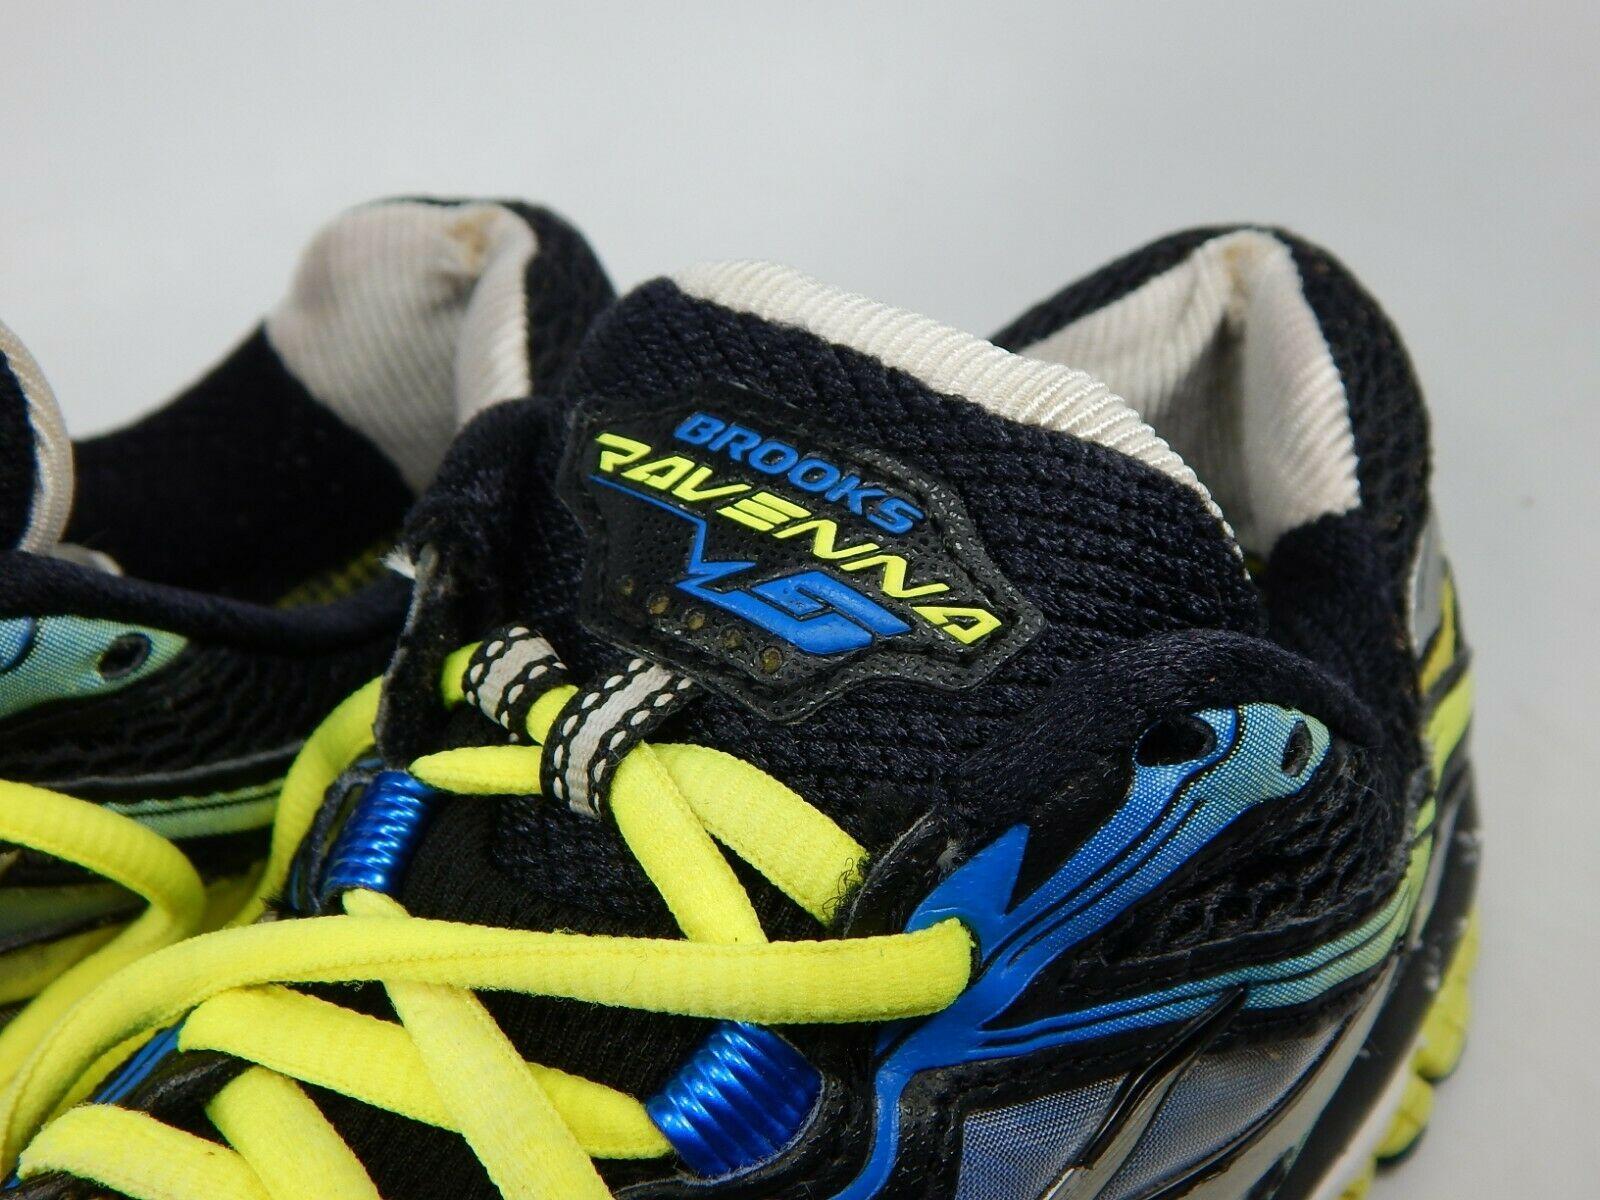 Brooks Ravenna 5 Size US 8.5 M (D) EU 42 Men's Running Shoes Black 1101561D048